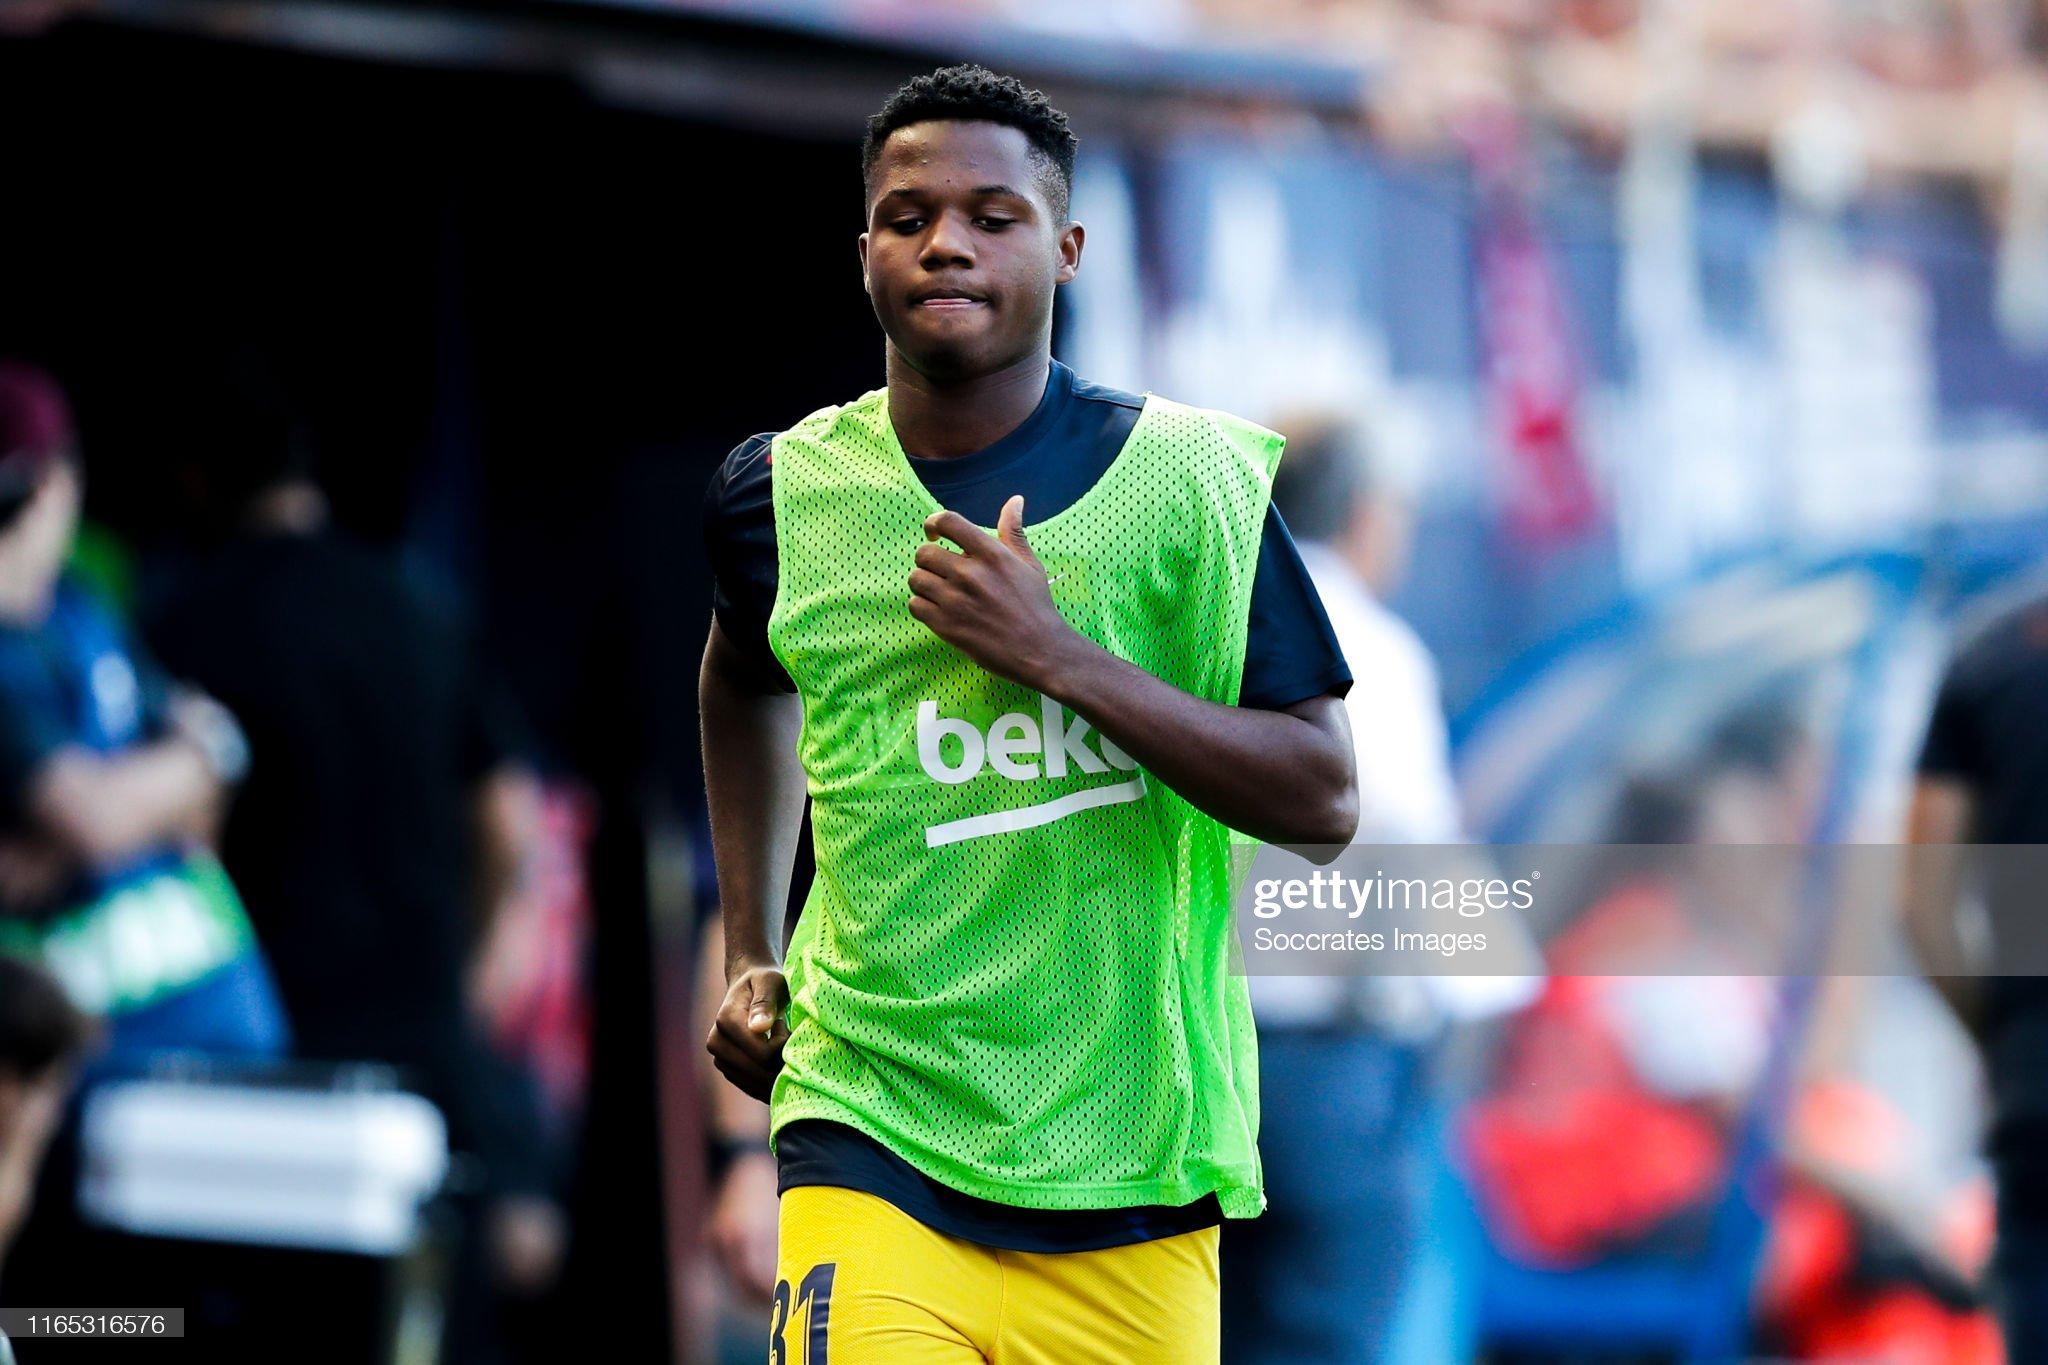 صور مباراة : أوساسونا - برشلونة 2-2 ( 31-08-2019 )  Ansu-fati-of-fc-barcelona-during-the-la-liga-santander-match-between-picture-id1165316576?s=2048x2048